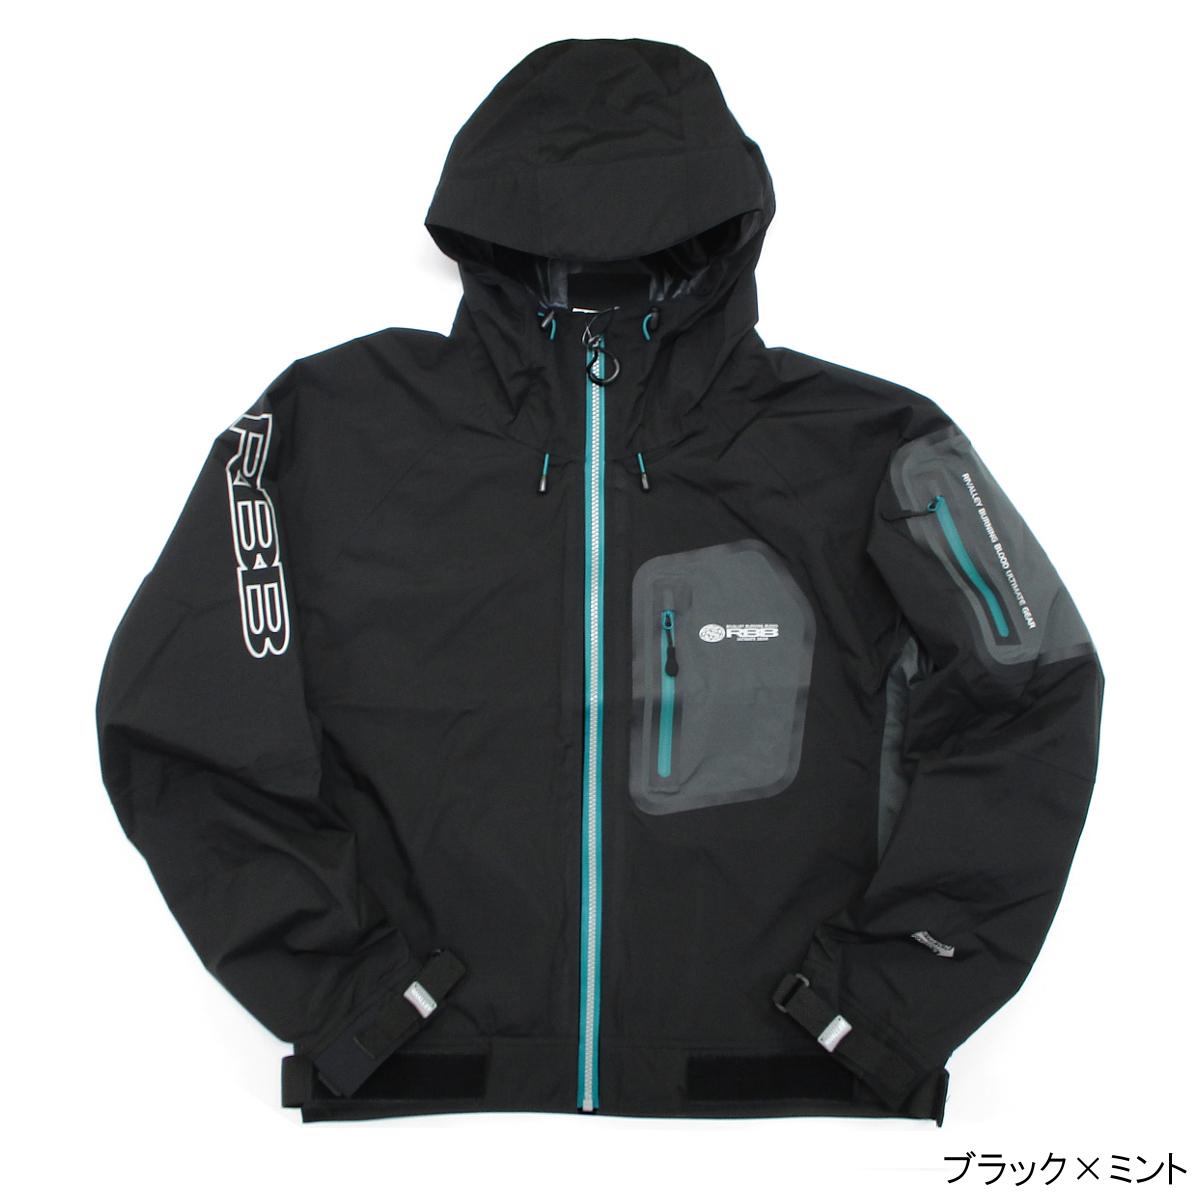 RBB タイドストレッチレインジャケット No.8746 LL ブラック×ミント(東日本店)